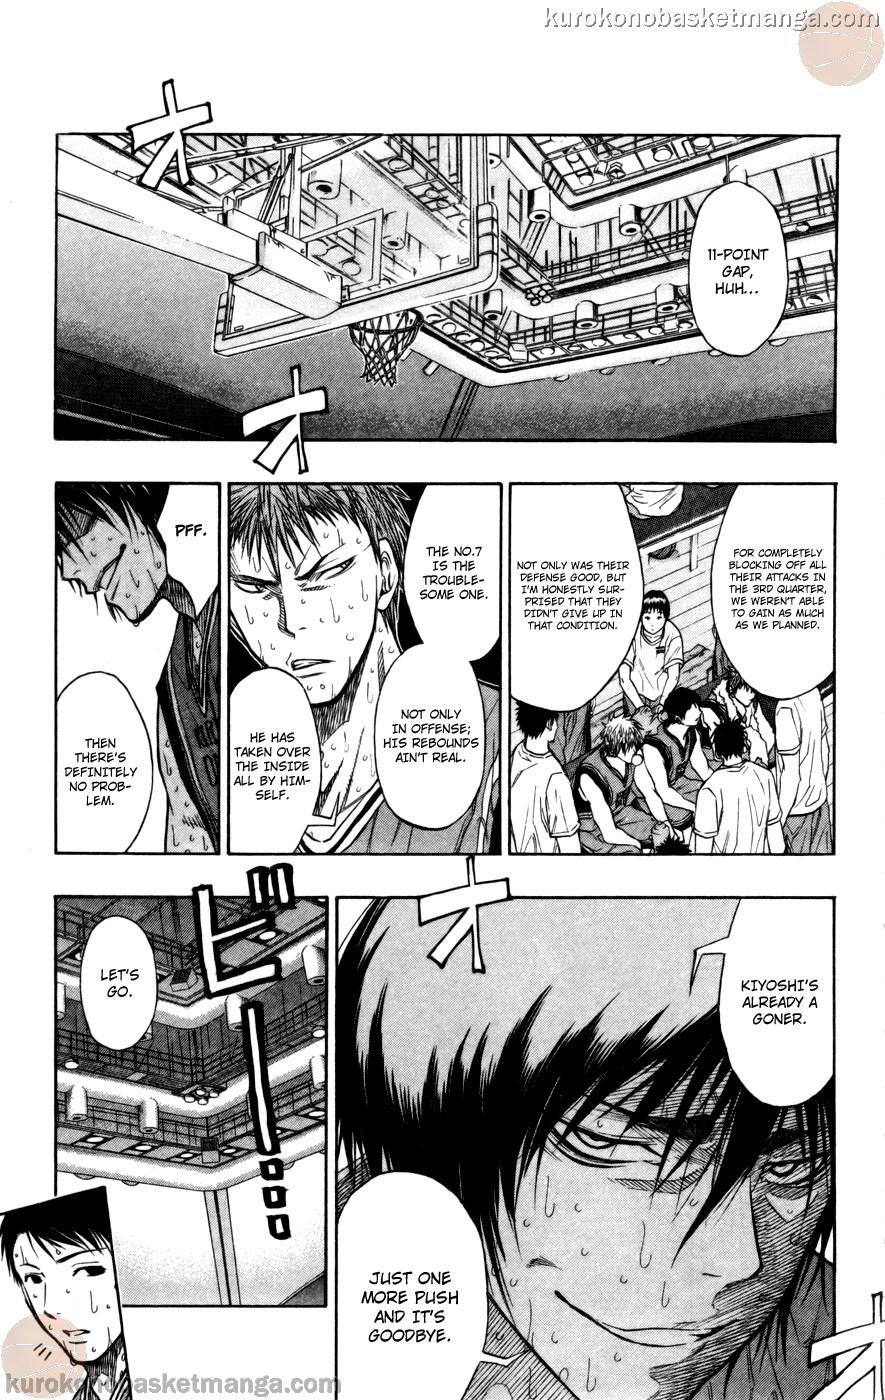 Kuroko no Basket Manga Chapter 105 - Image 04